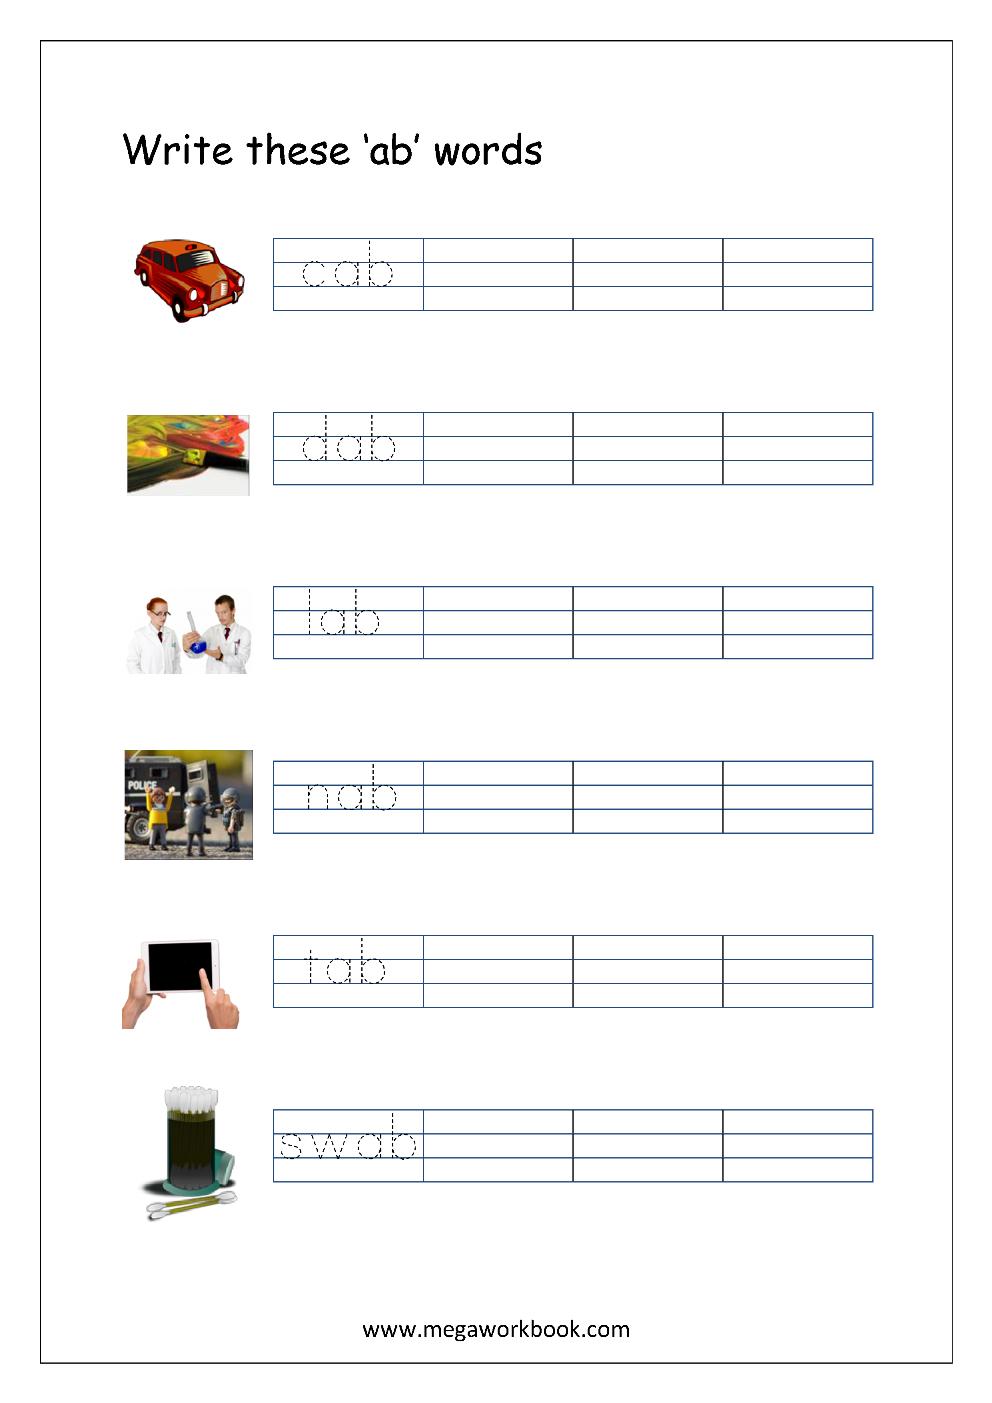 Free Printable Cvc Words Writing Worksheets For Kids - Three Letter - Cvc Words Worksheets Free Printable